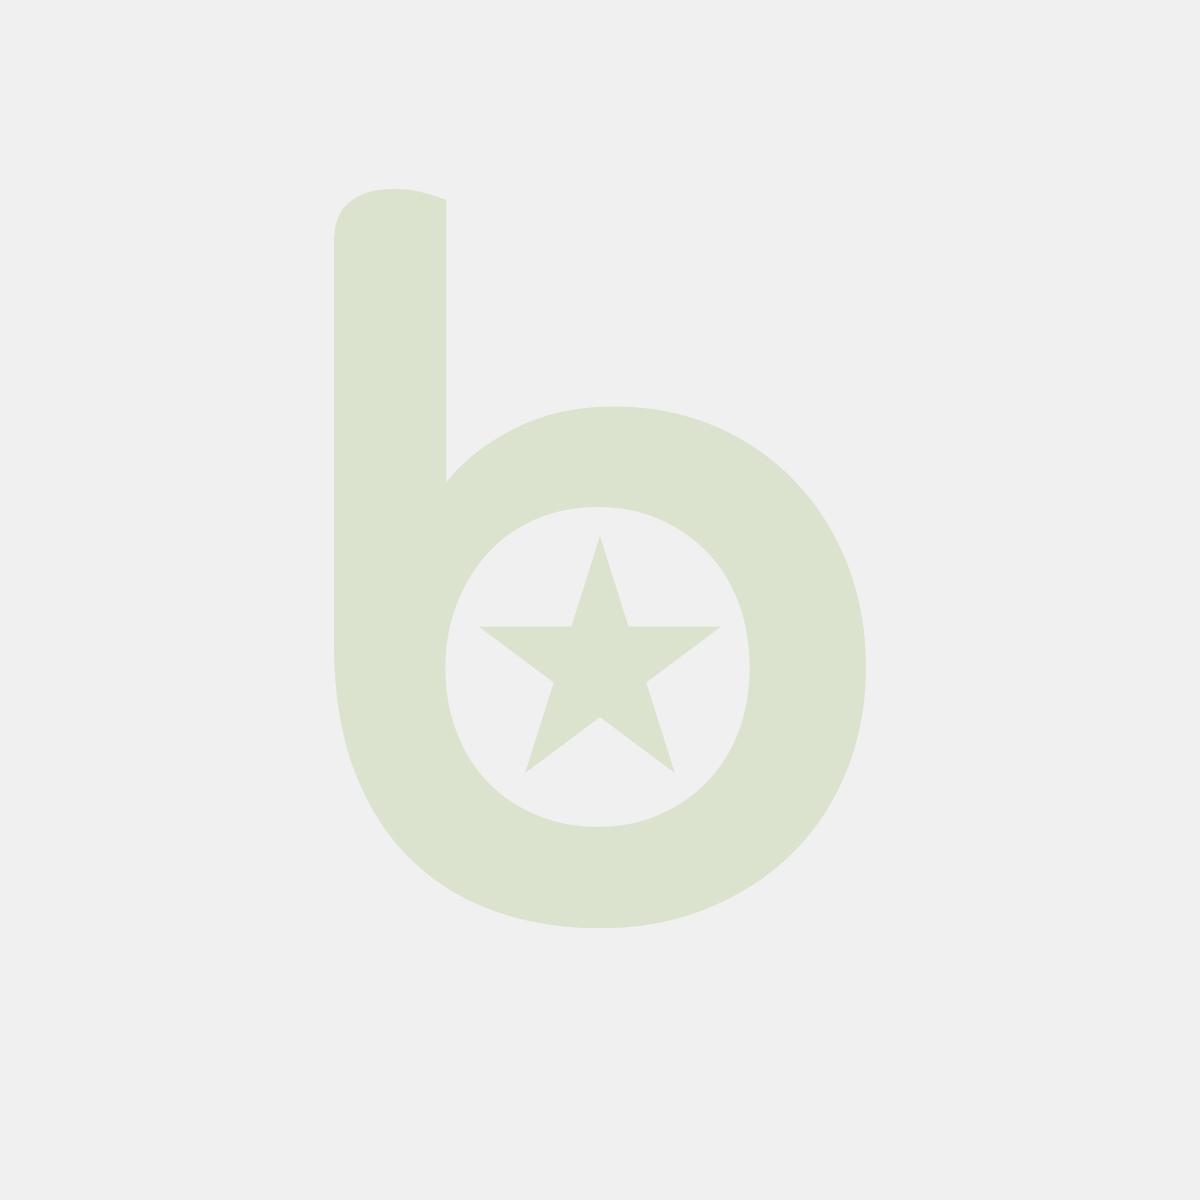 FINGERFOOD - MINI tacka SABERT biała PS 6x6x1 cm op. 50 sztuk